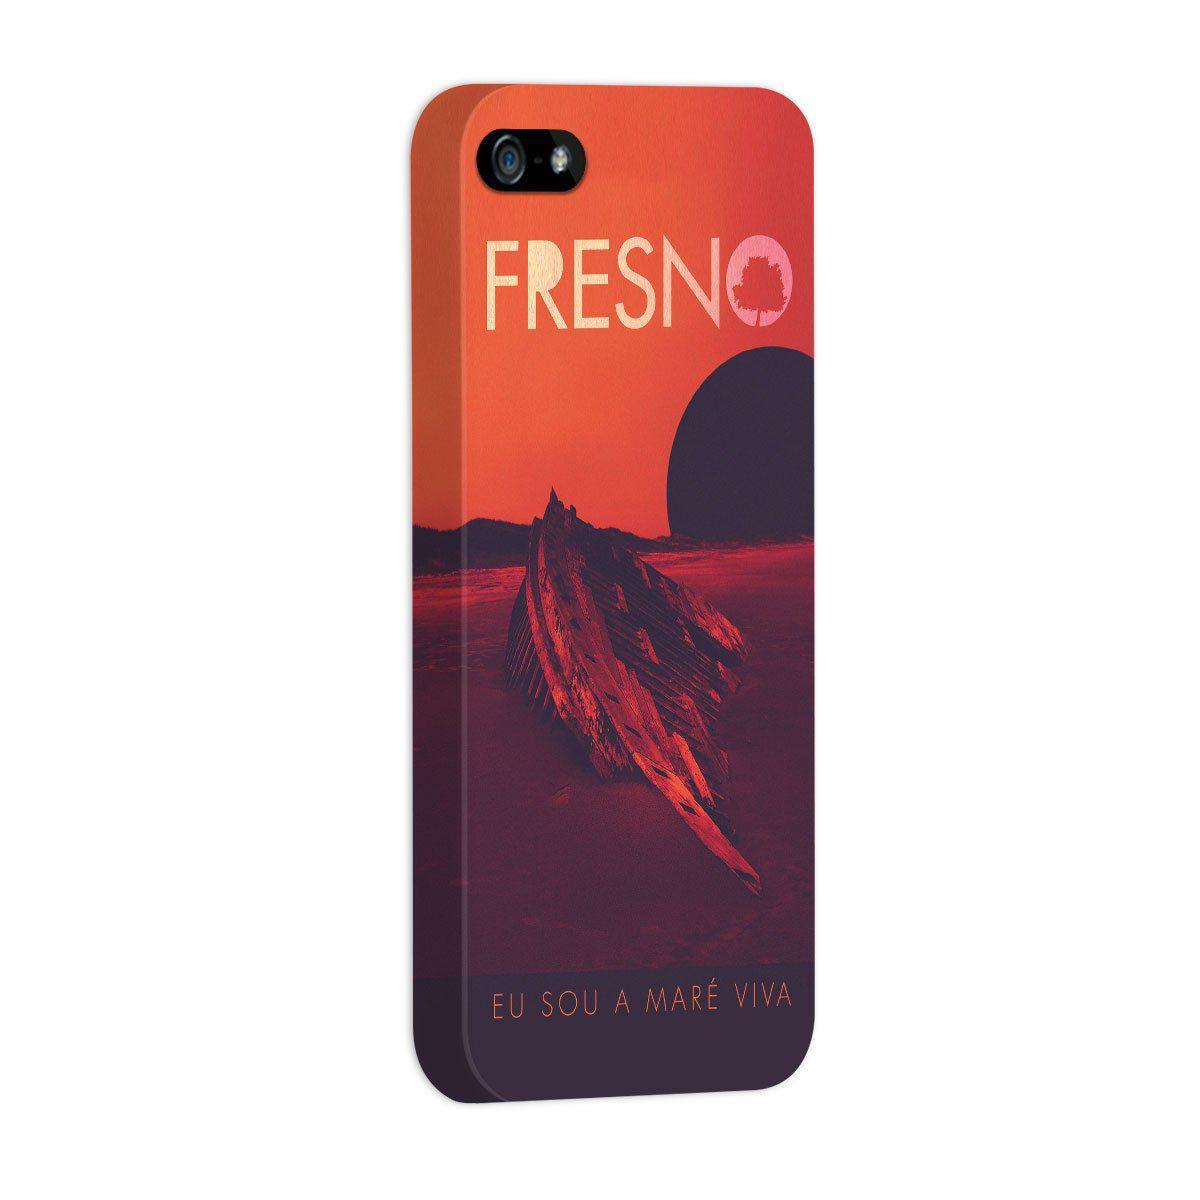 Capa para iPhone 5/5S Fresno - Capa EP